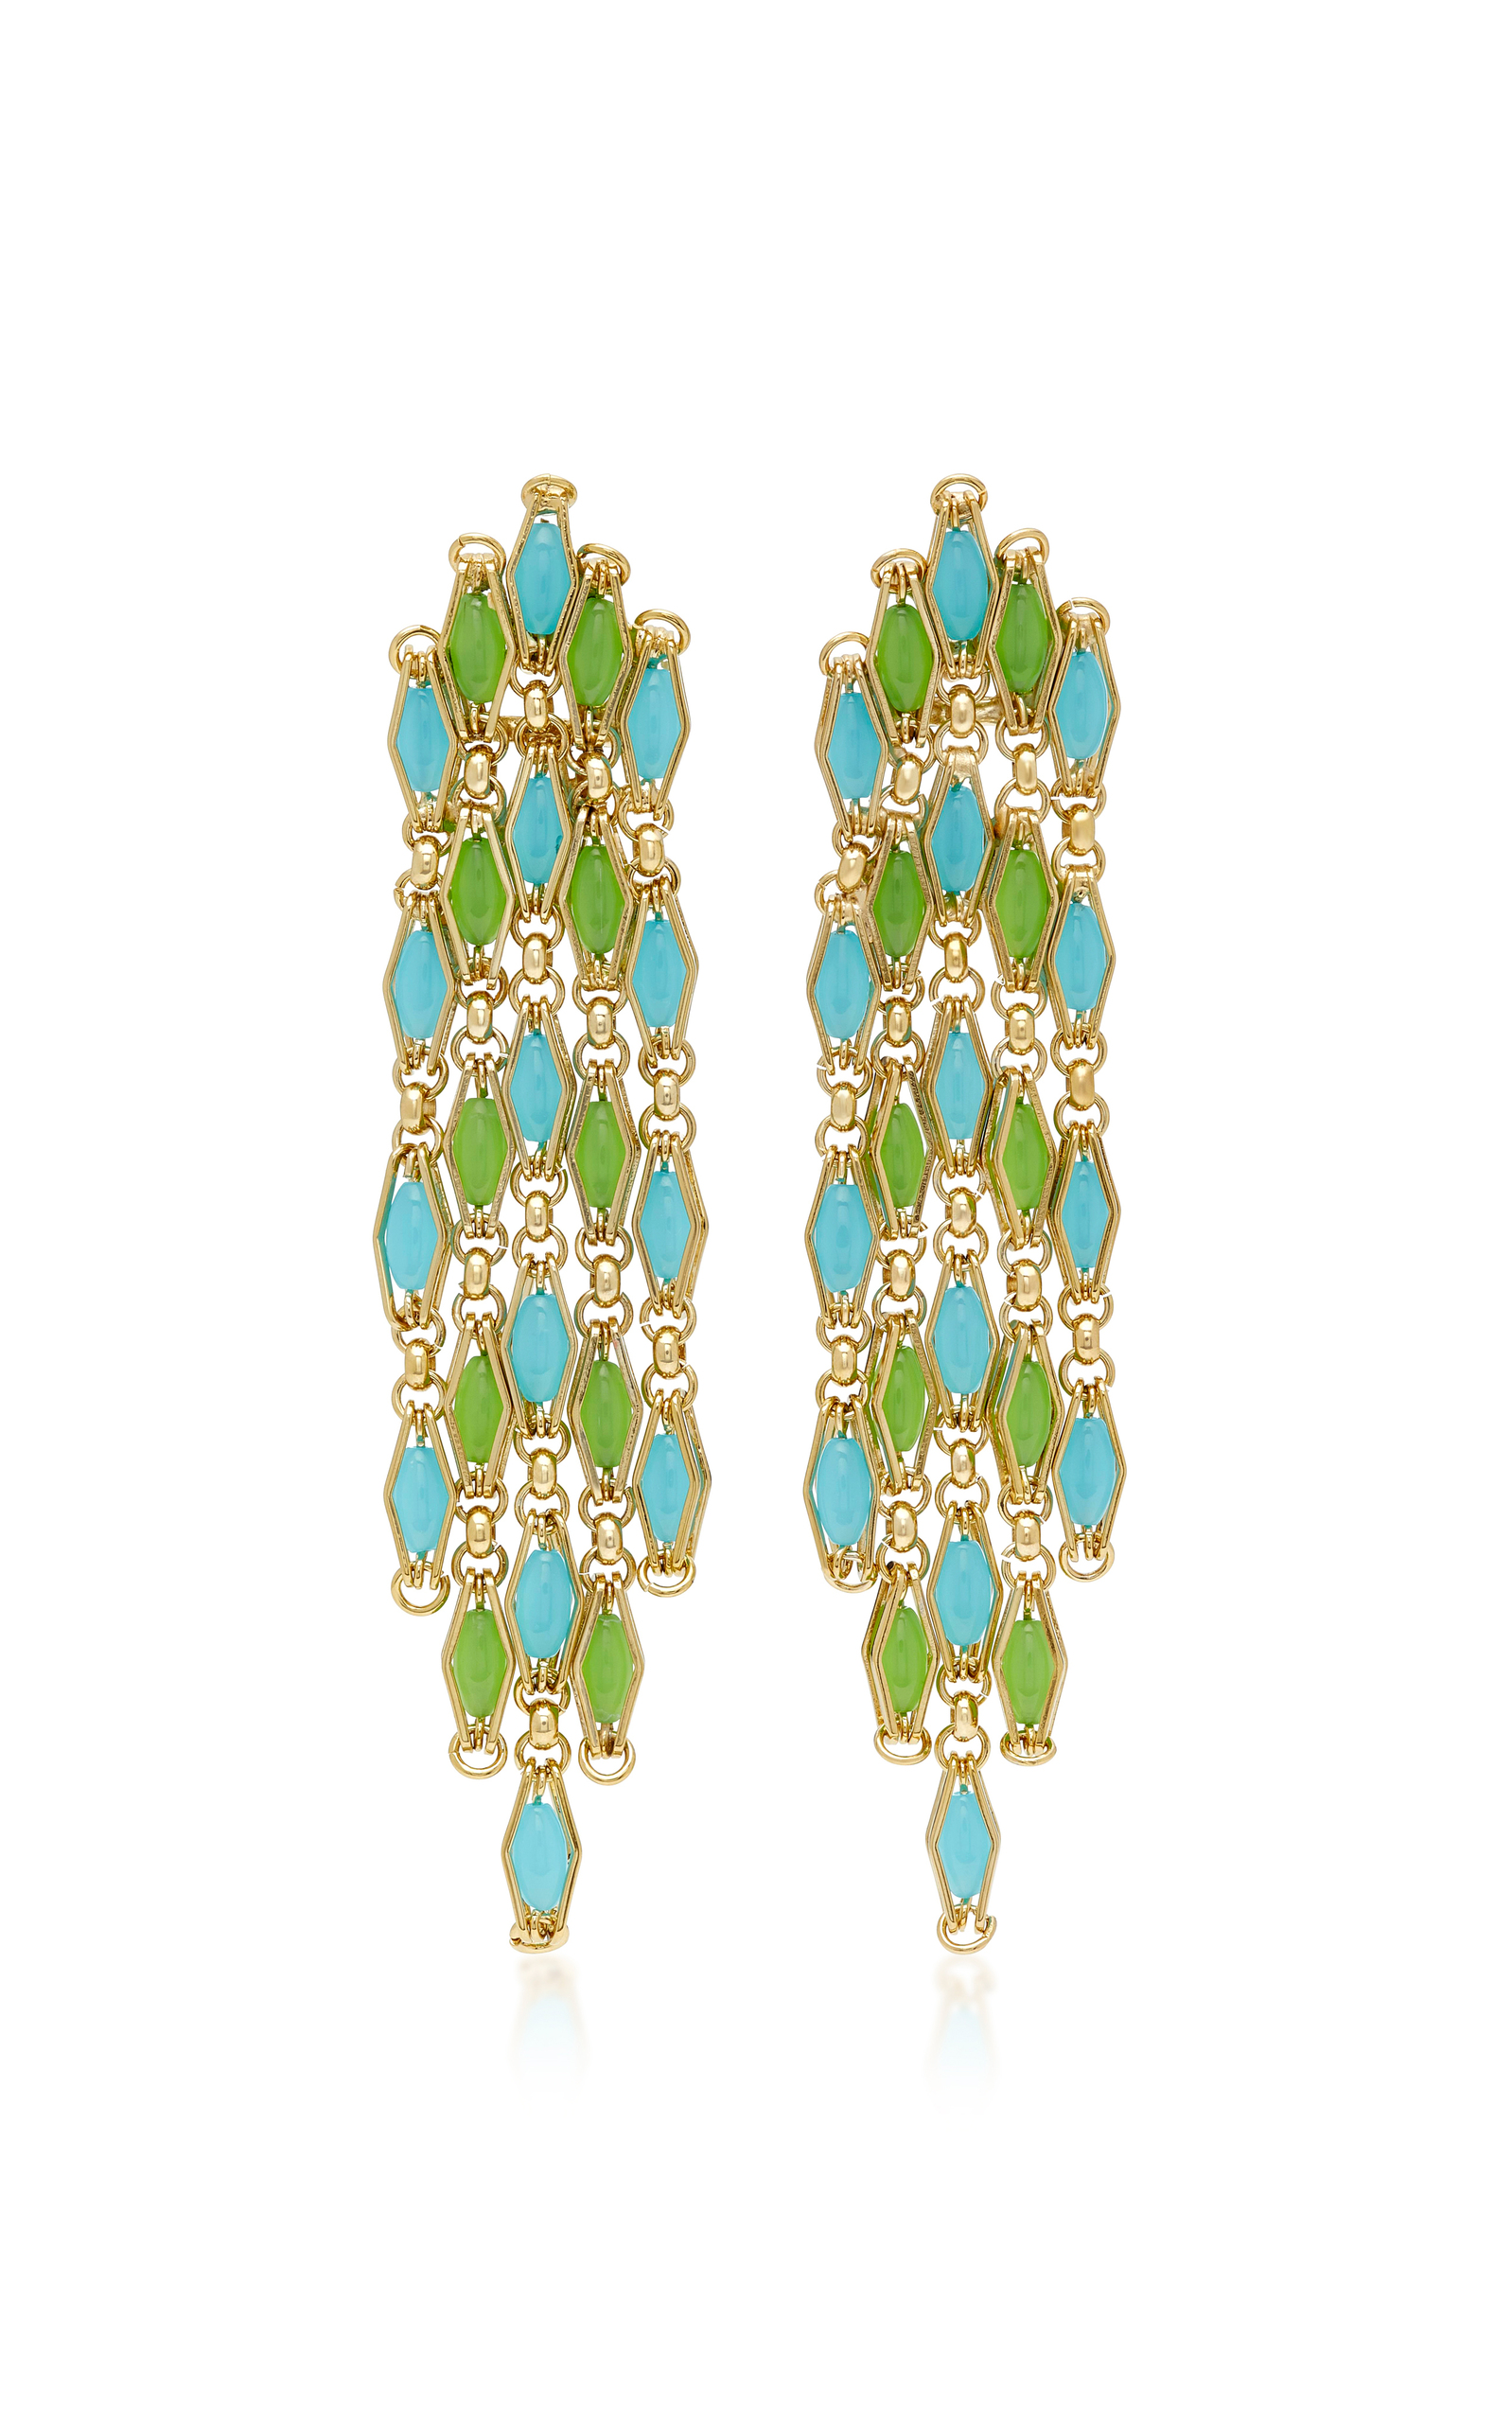 Destino Gold-Tone Brass and Quartz Earrings Rosantica wsoJRT0h